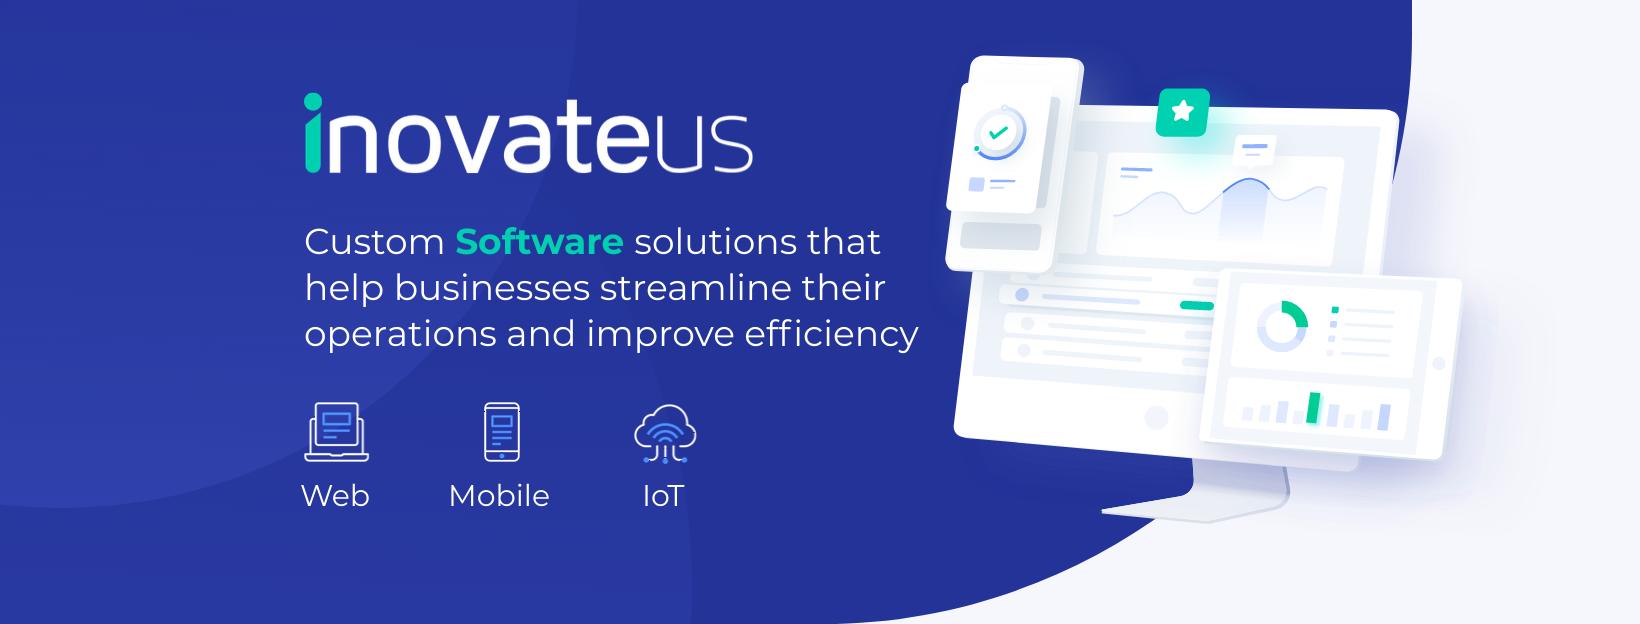 Novateus Software Development in Baton Rouge